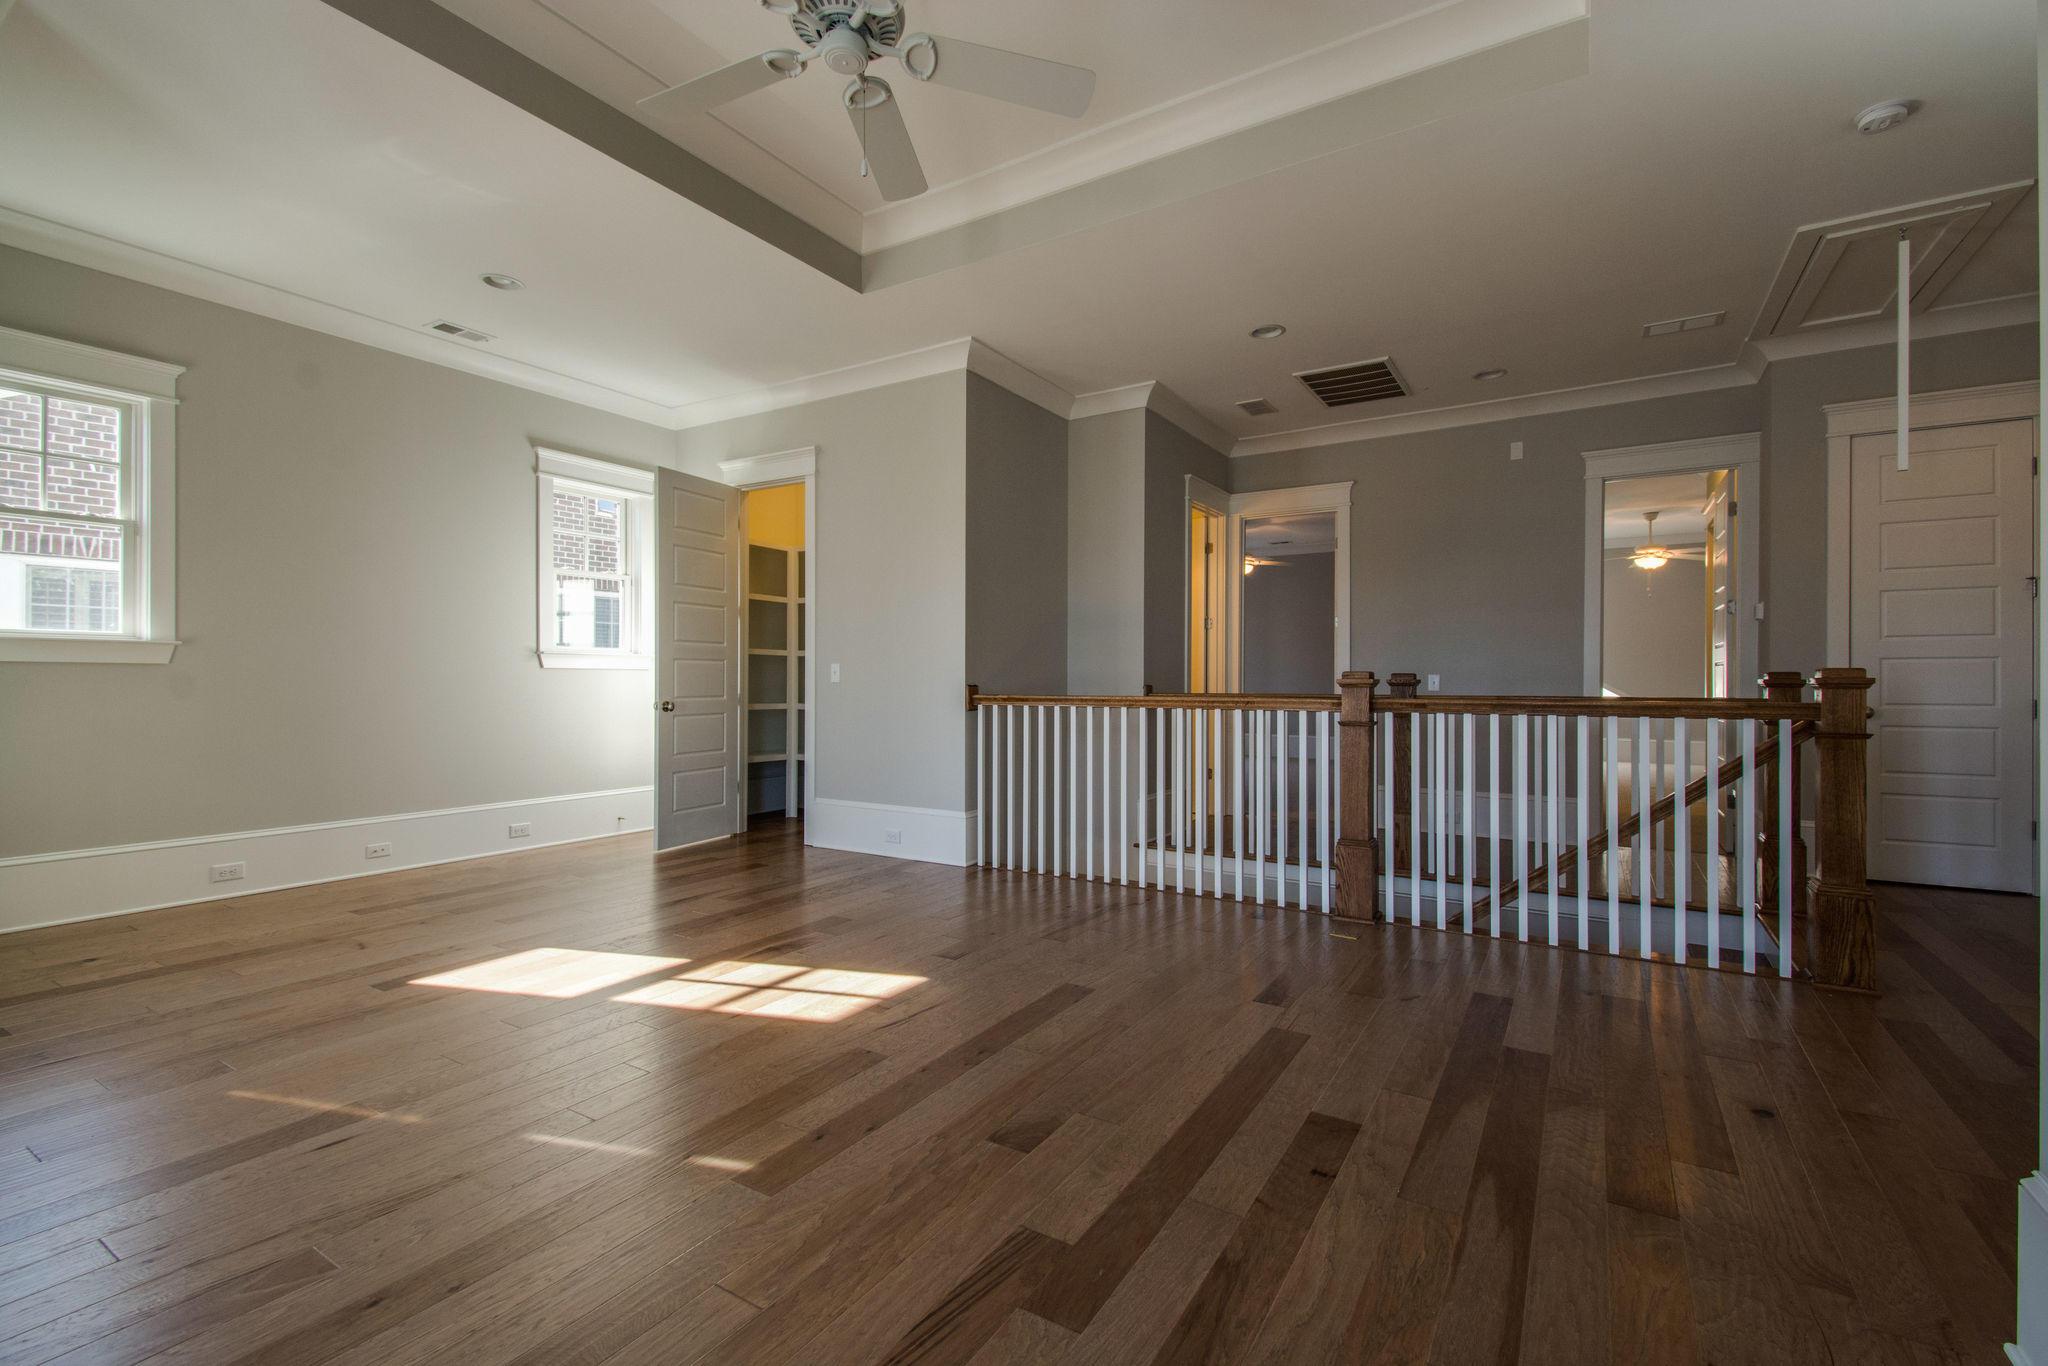 Daniel Island Park Homes For Sale - 112 Brailsford, Charleston, SC - 13